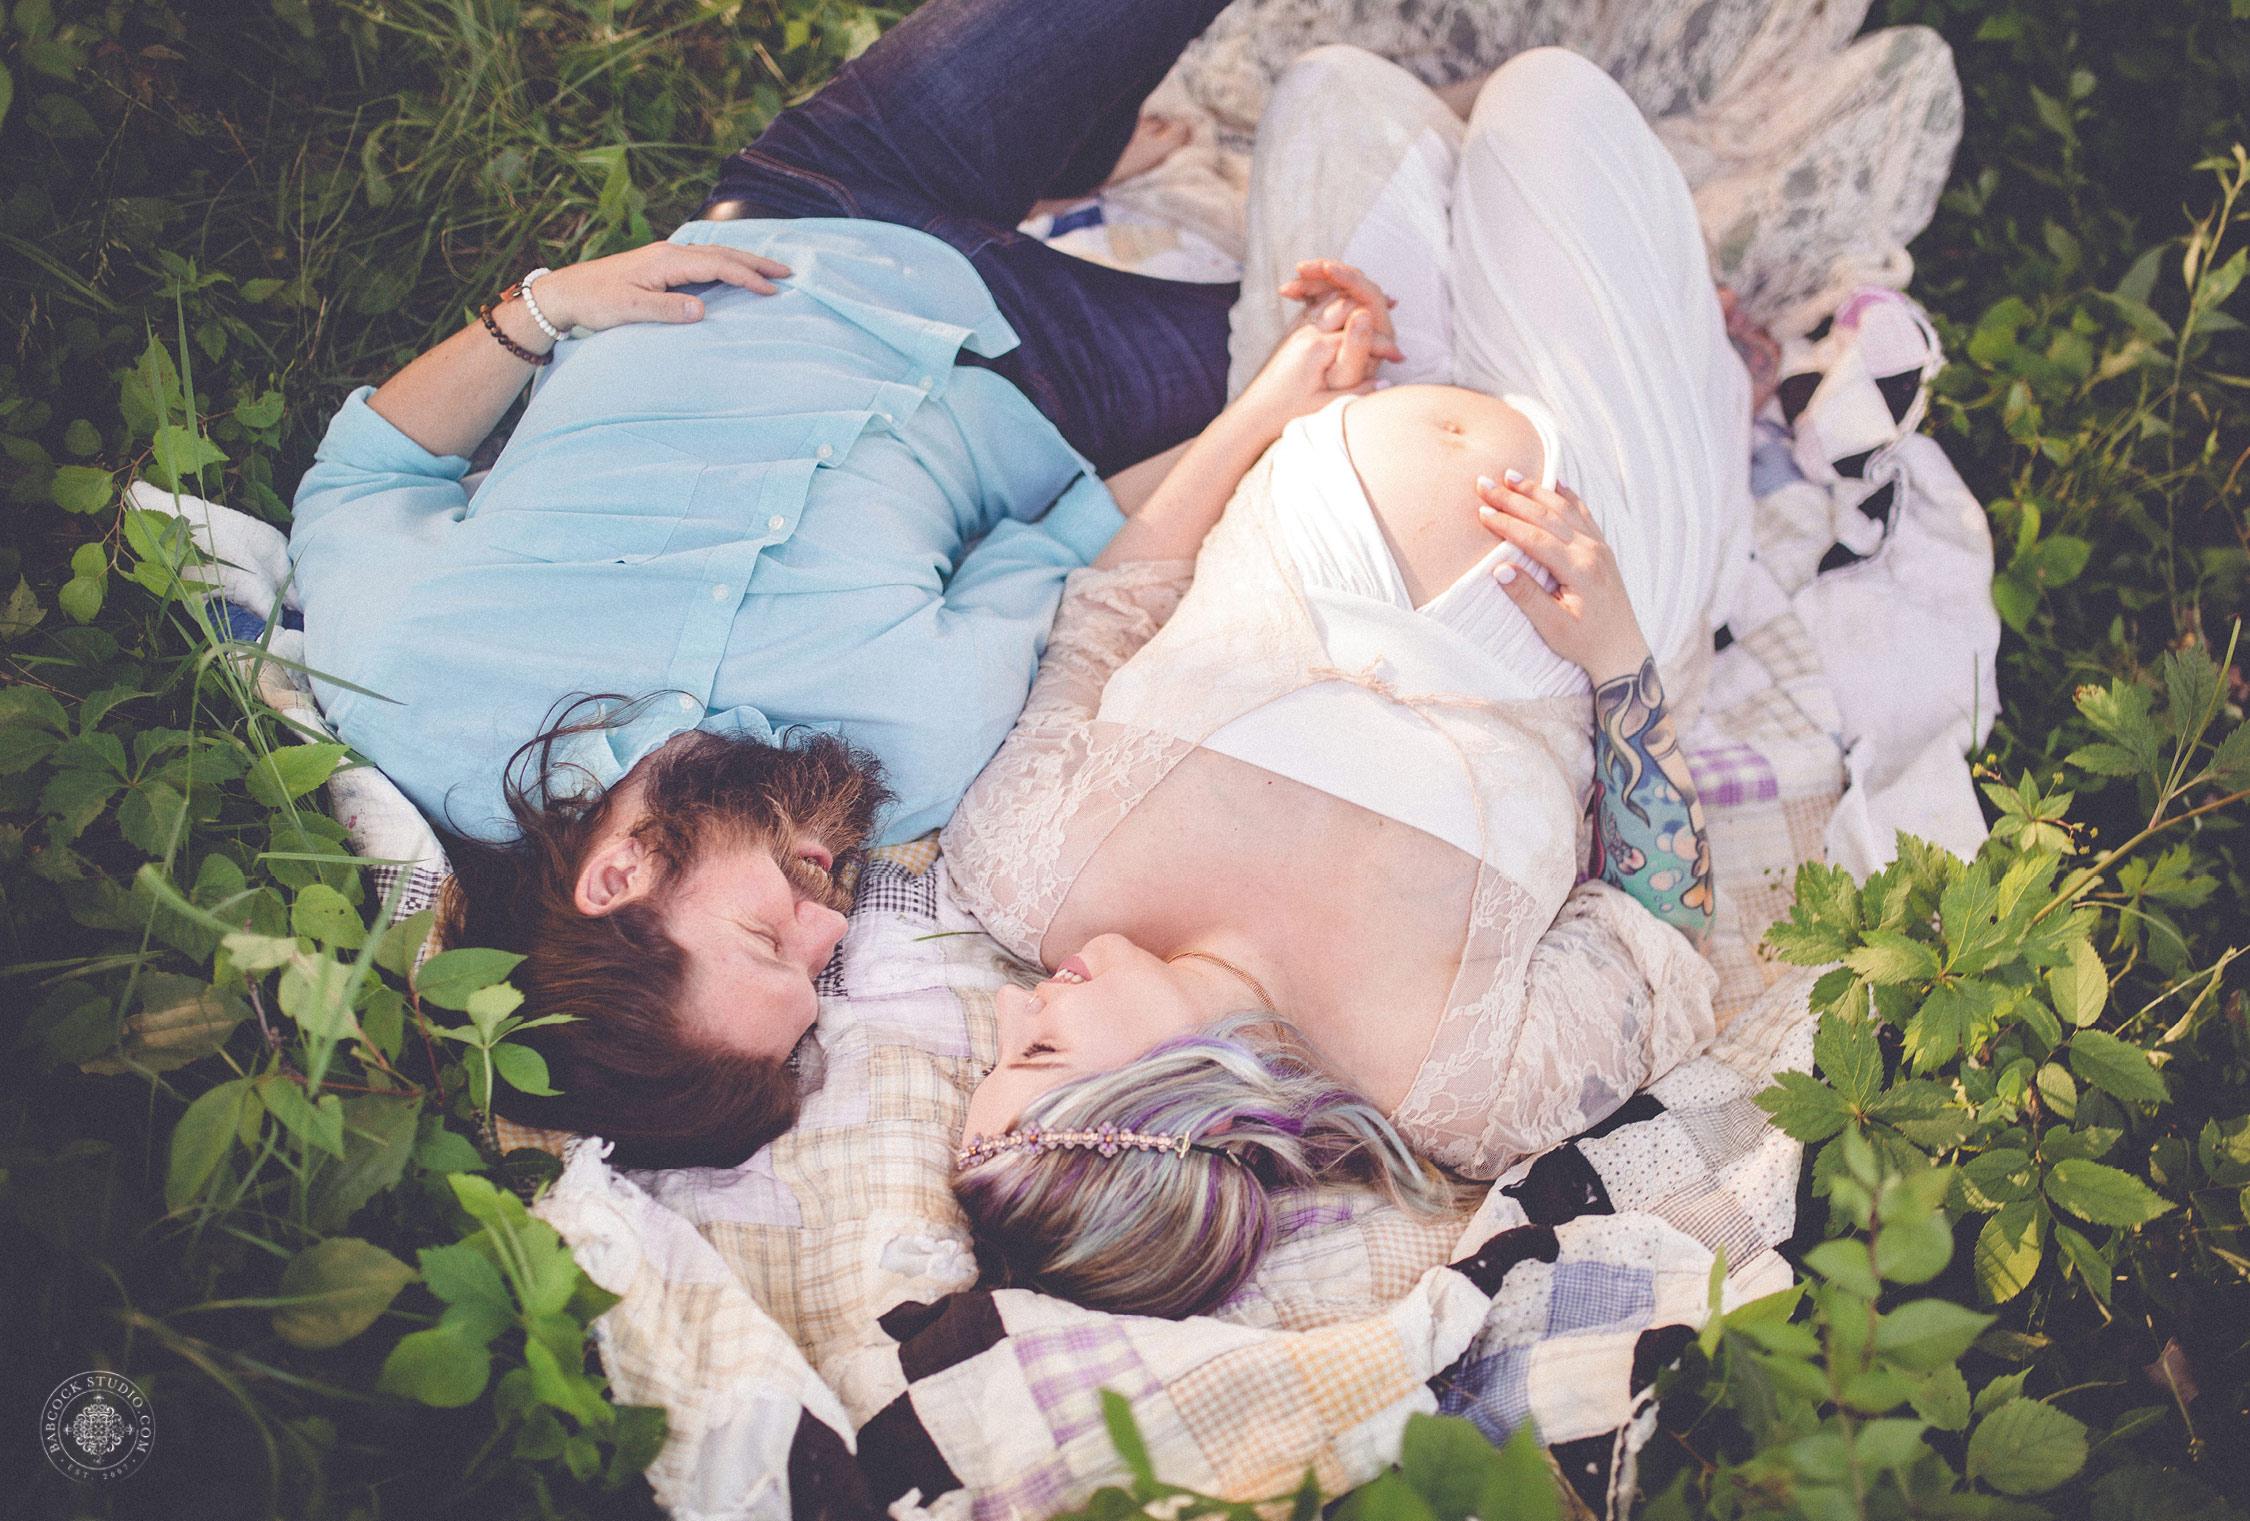 rachel-matt-maternity-pregnancy-photographer-dayton-ohio-8.jpg